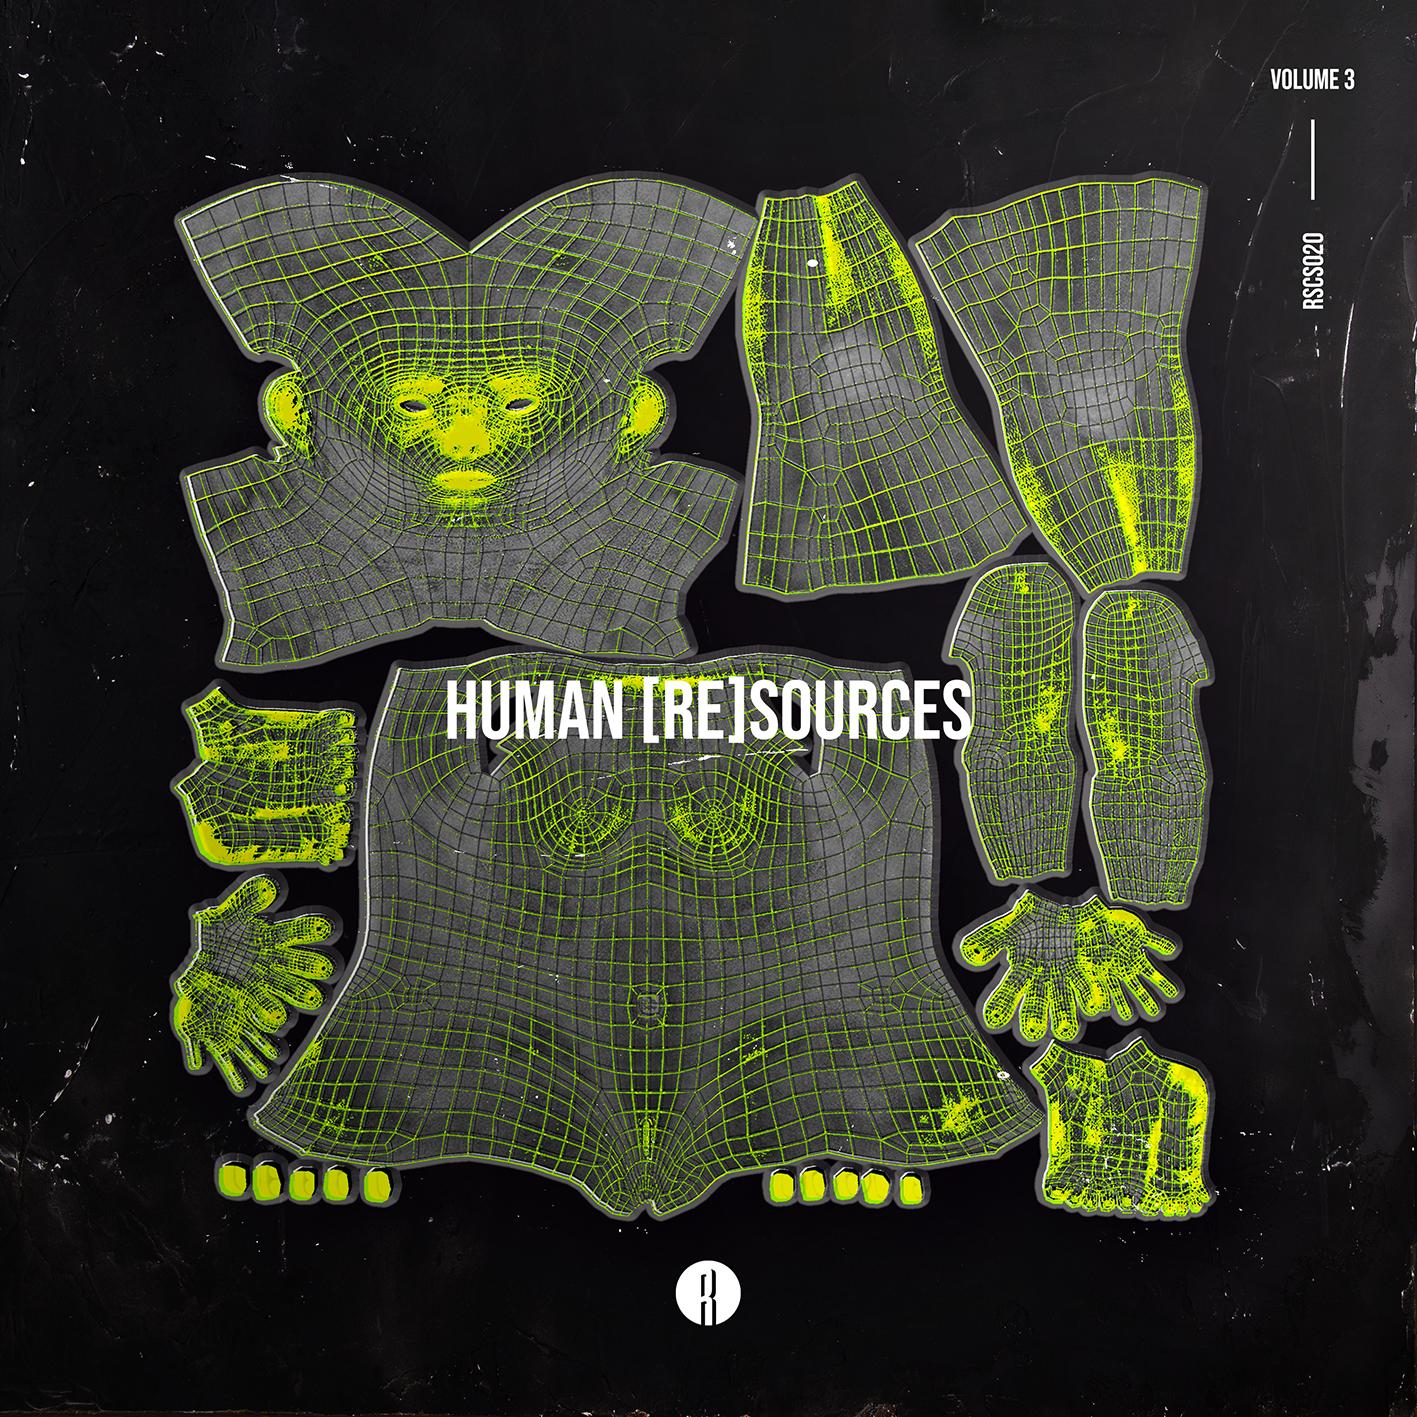 HUMAN-RE-SOURCES-VOL-3